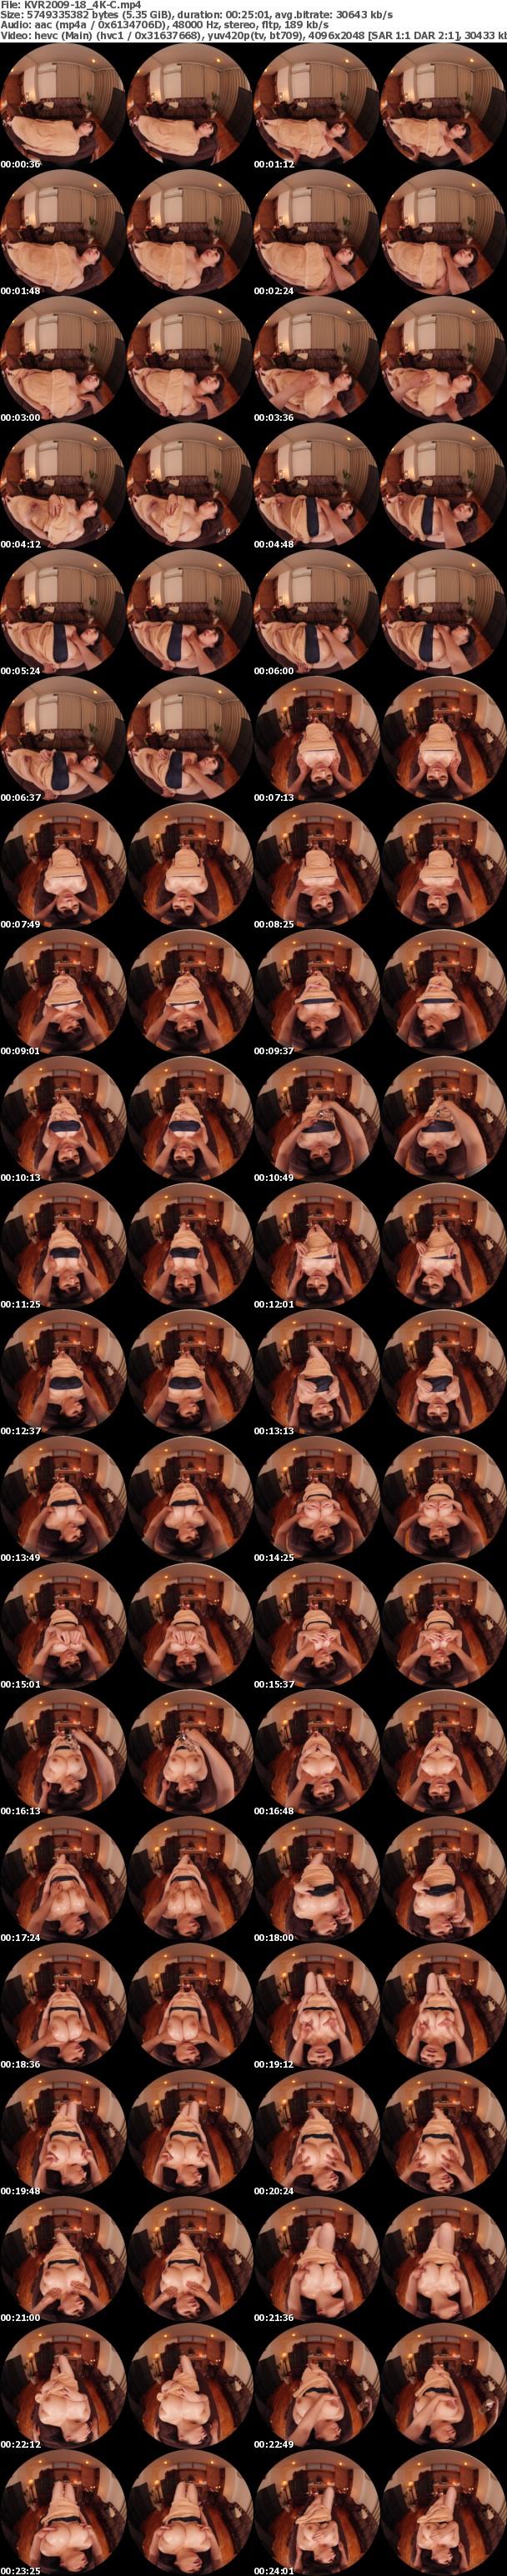 (VR) KVR2009-18【4K匠】リアル悪徳エステ体験!一般客に媚薬を飲ませ高級オイルマッサージで感度覚醒!生中出し!6 夕季ちとせ